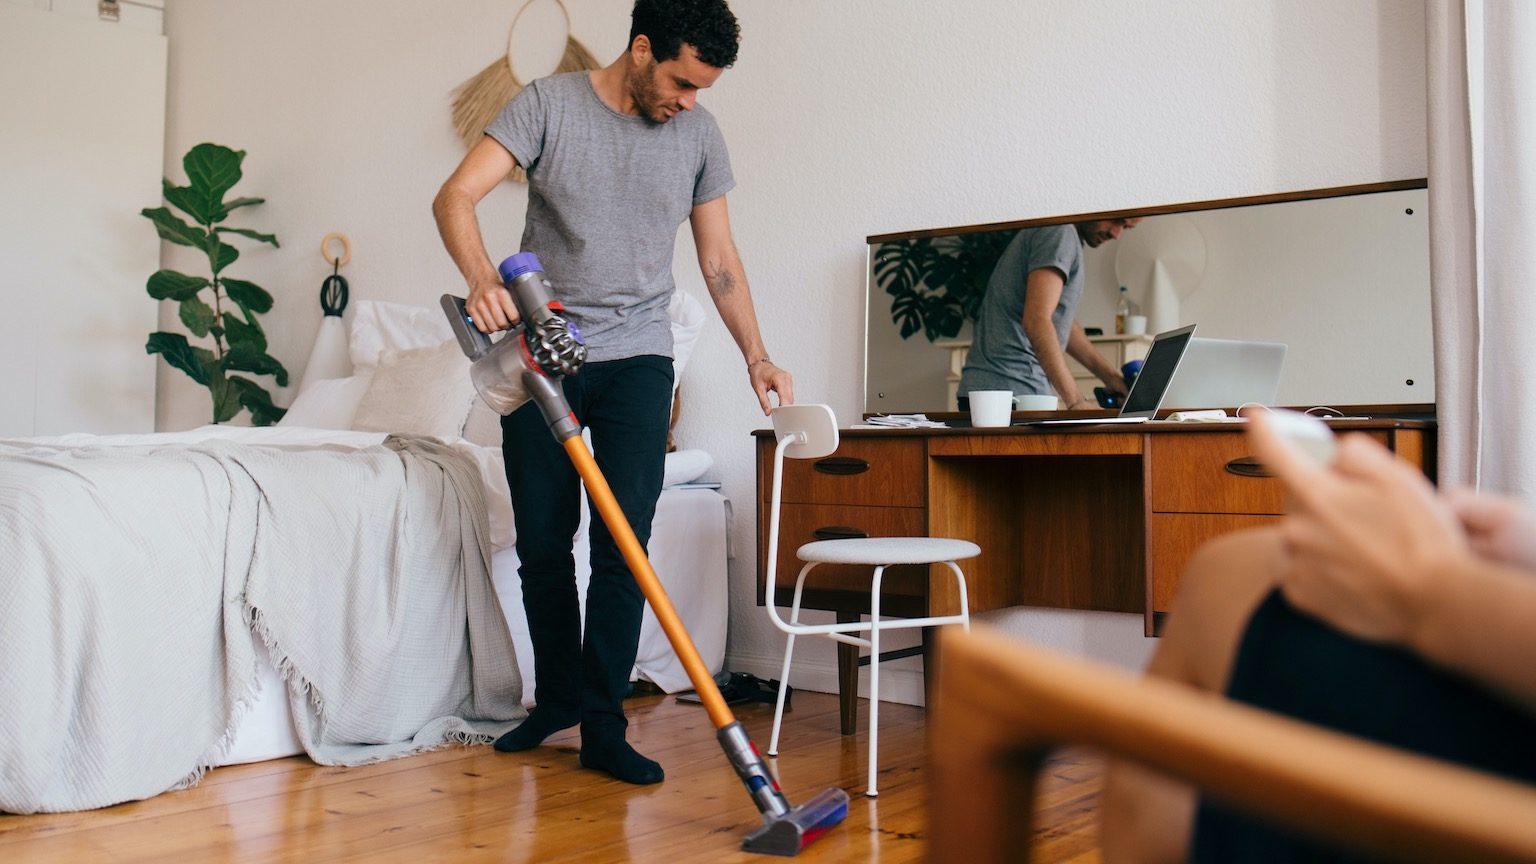 Man vacuuming a hardwood floor using a stick vacuum